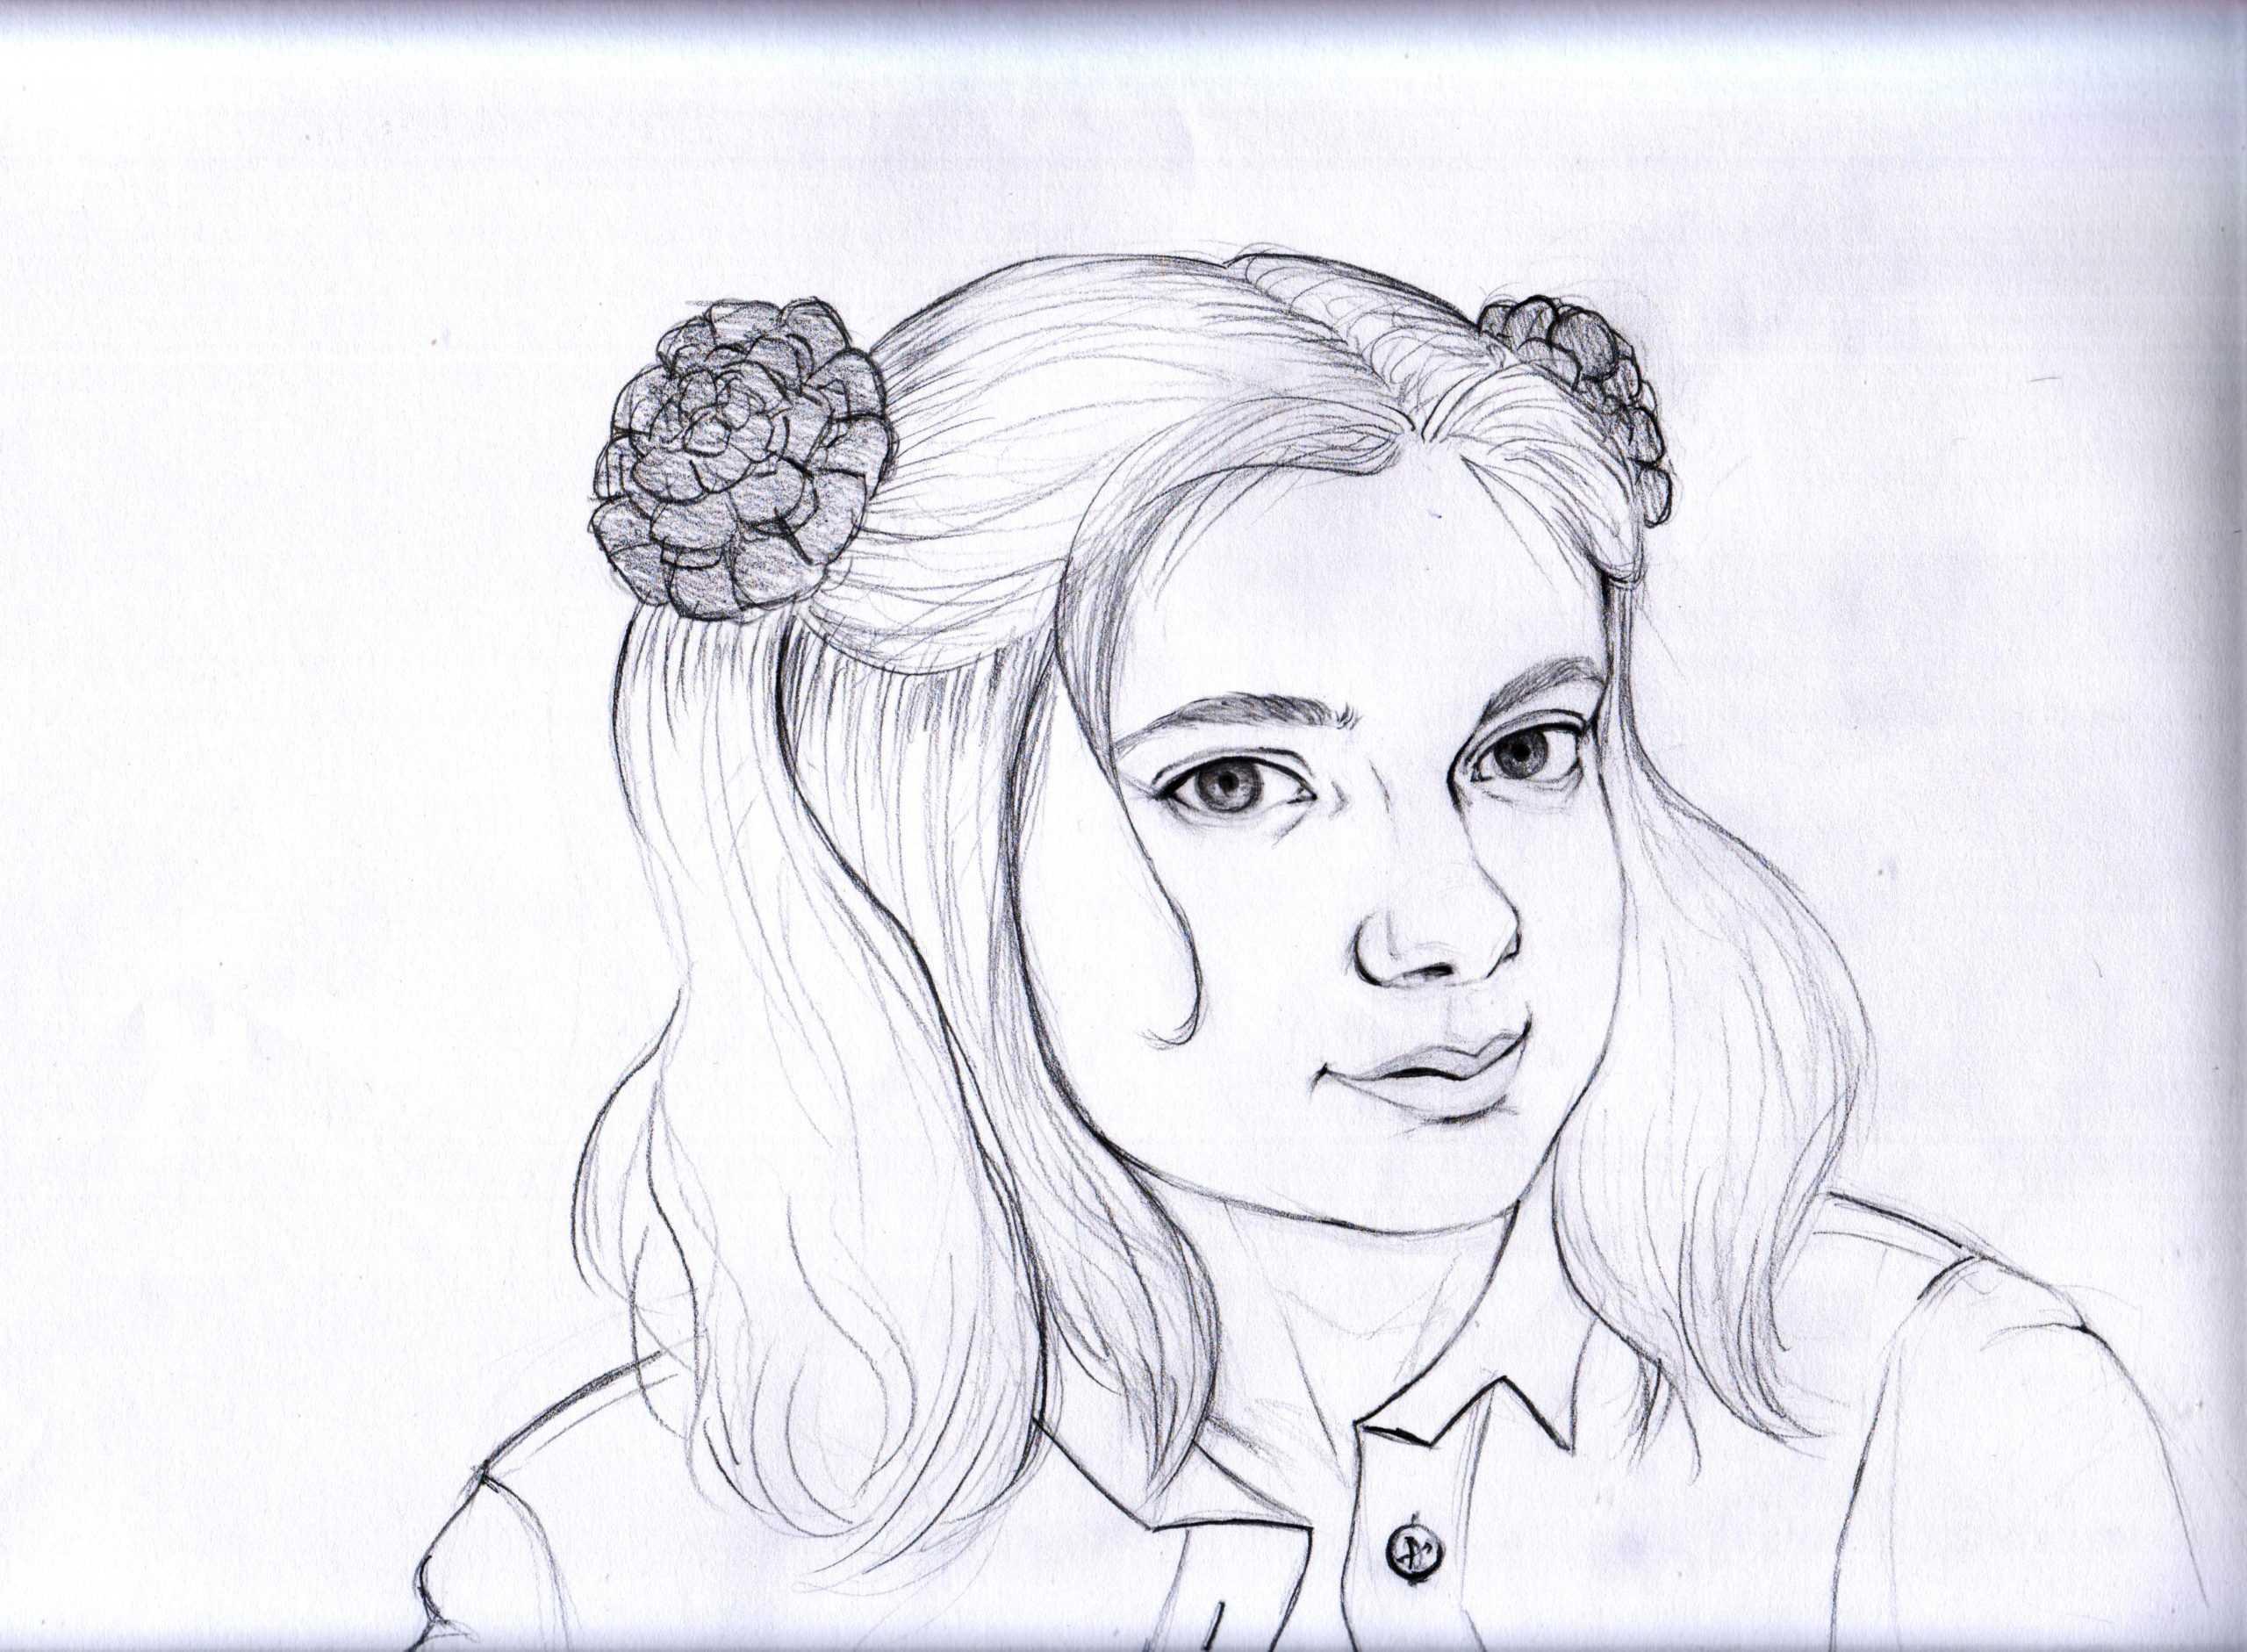 autoportrait_rossignol_e-1a.jpg-scaled.jpg